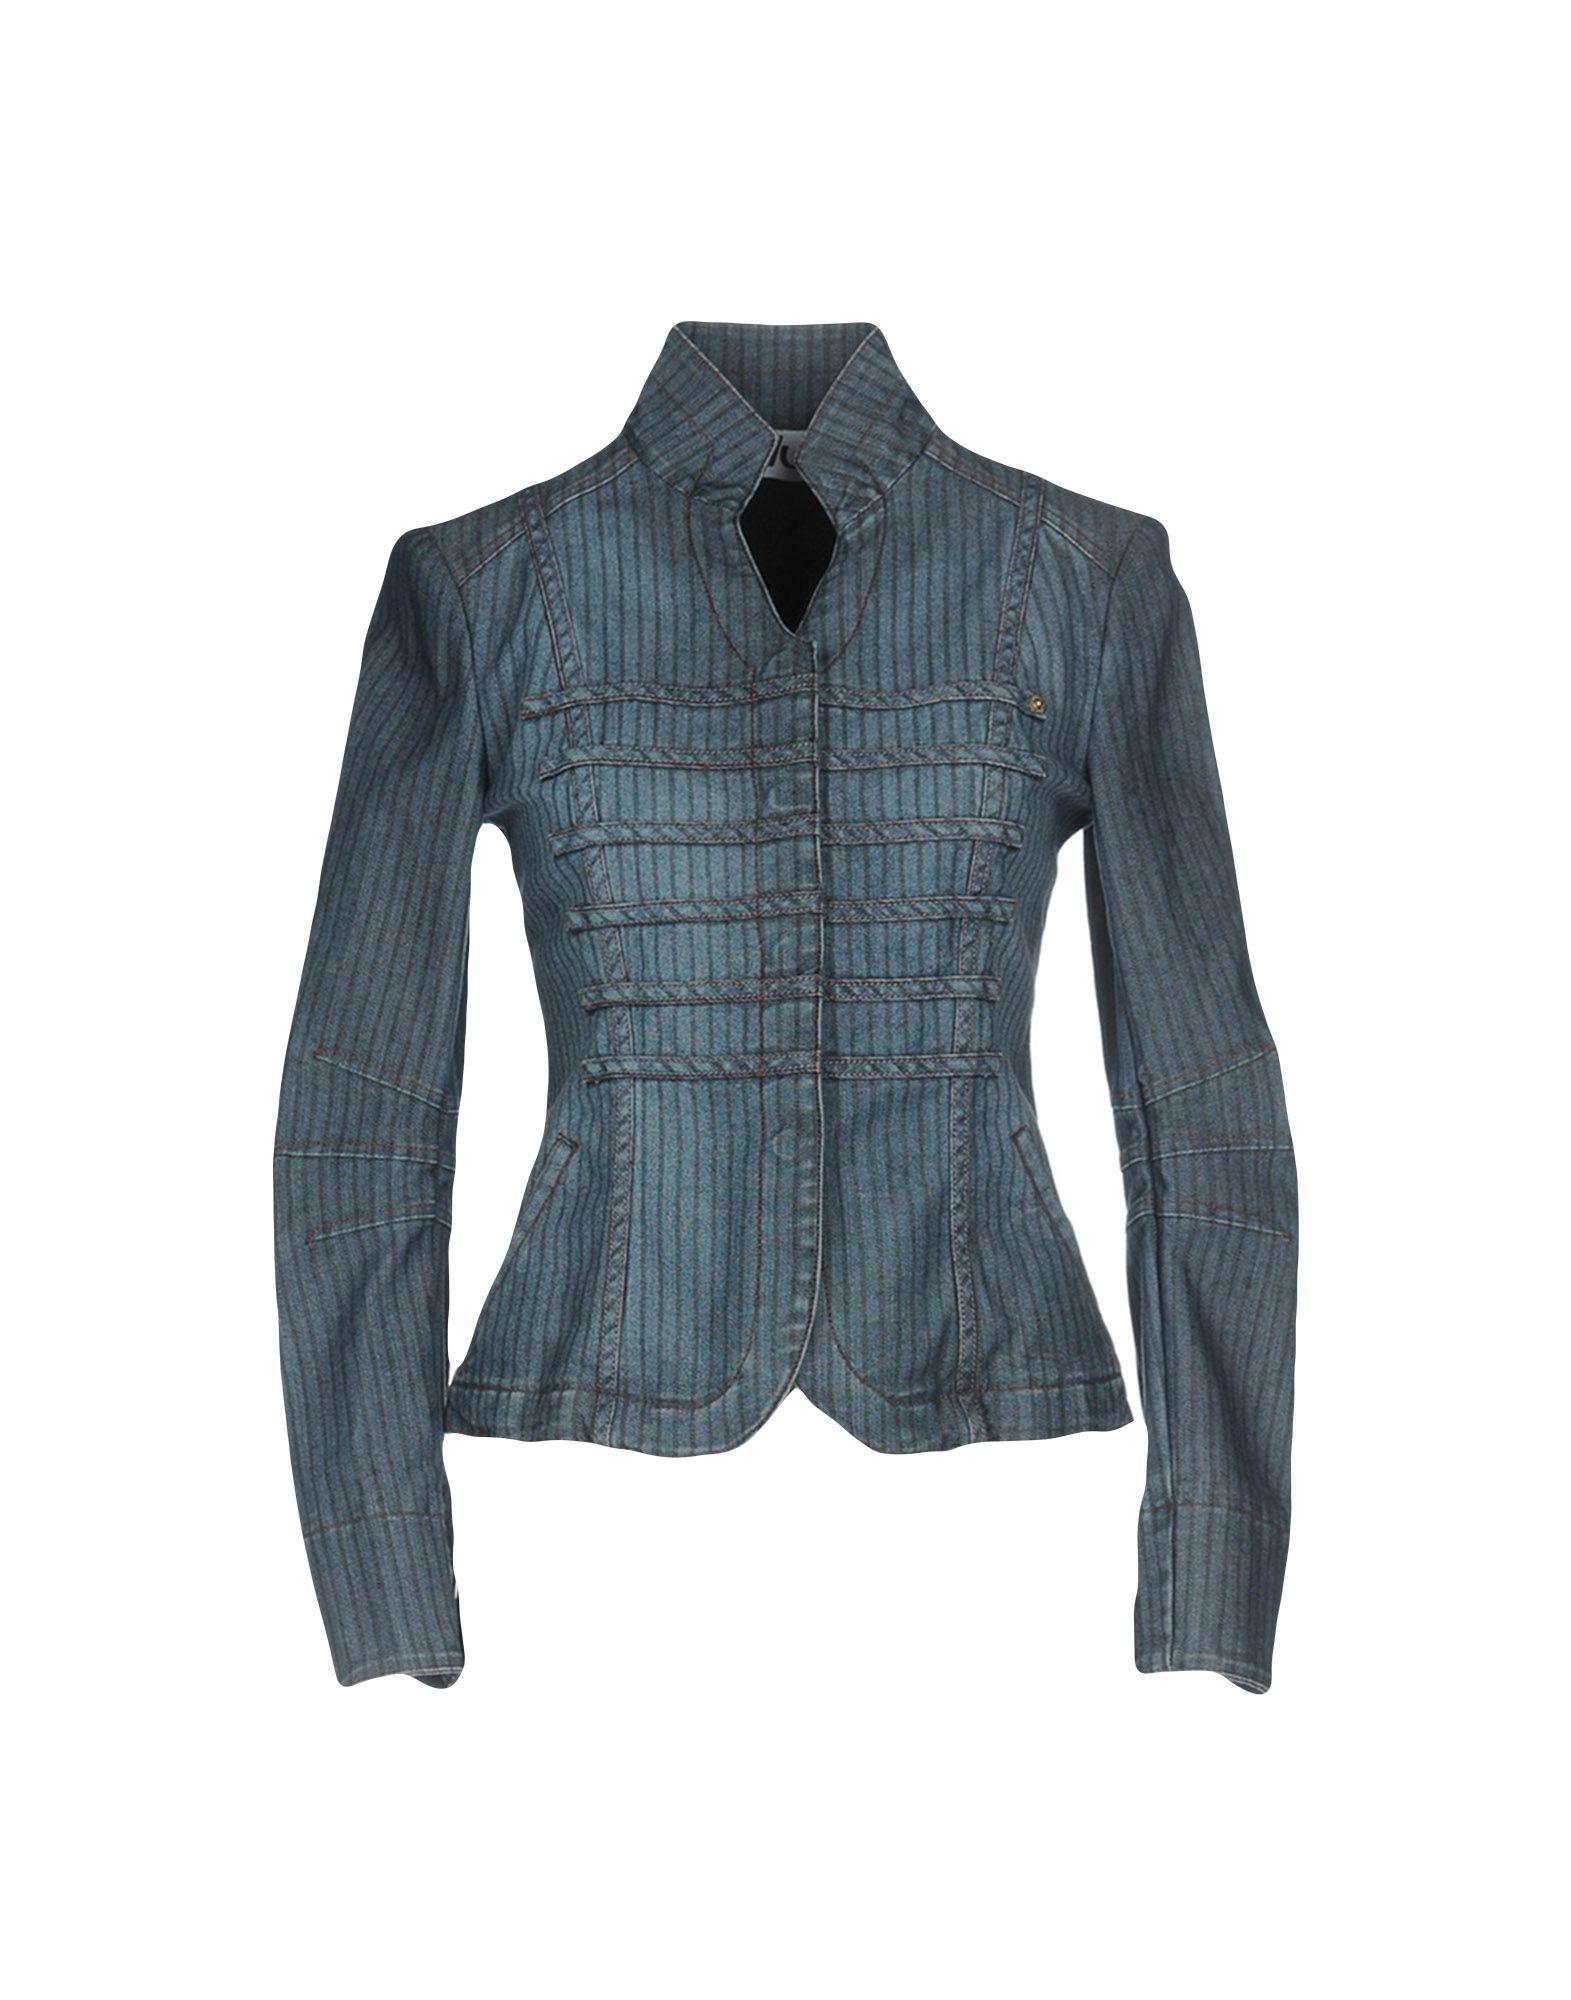 BLU BYBLOS Джинсовая верхняя одежда верхняя одежда